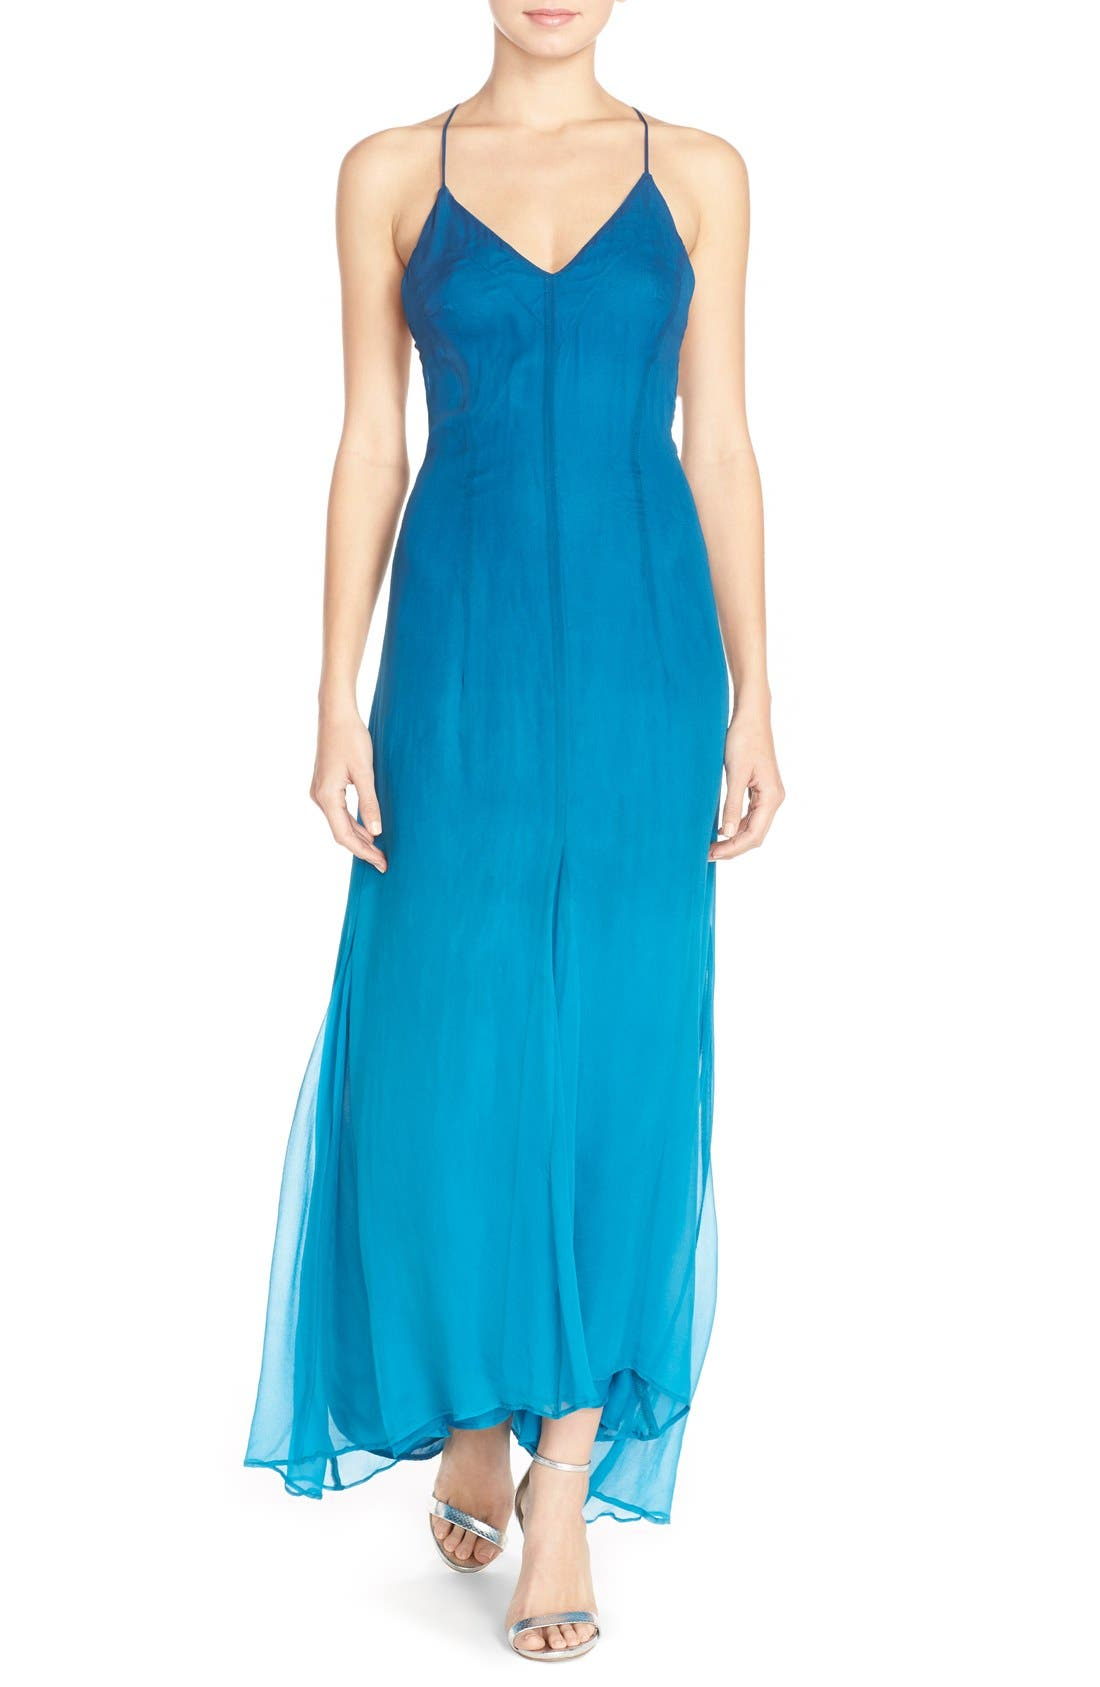 Main Image - Charlie Jade Ombré Maxi Dress with High/Low Hem